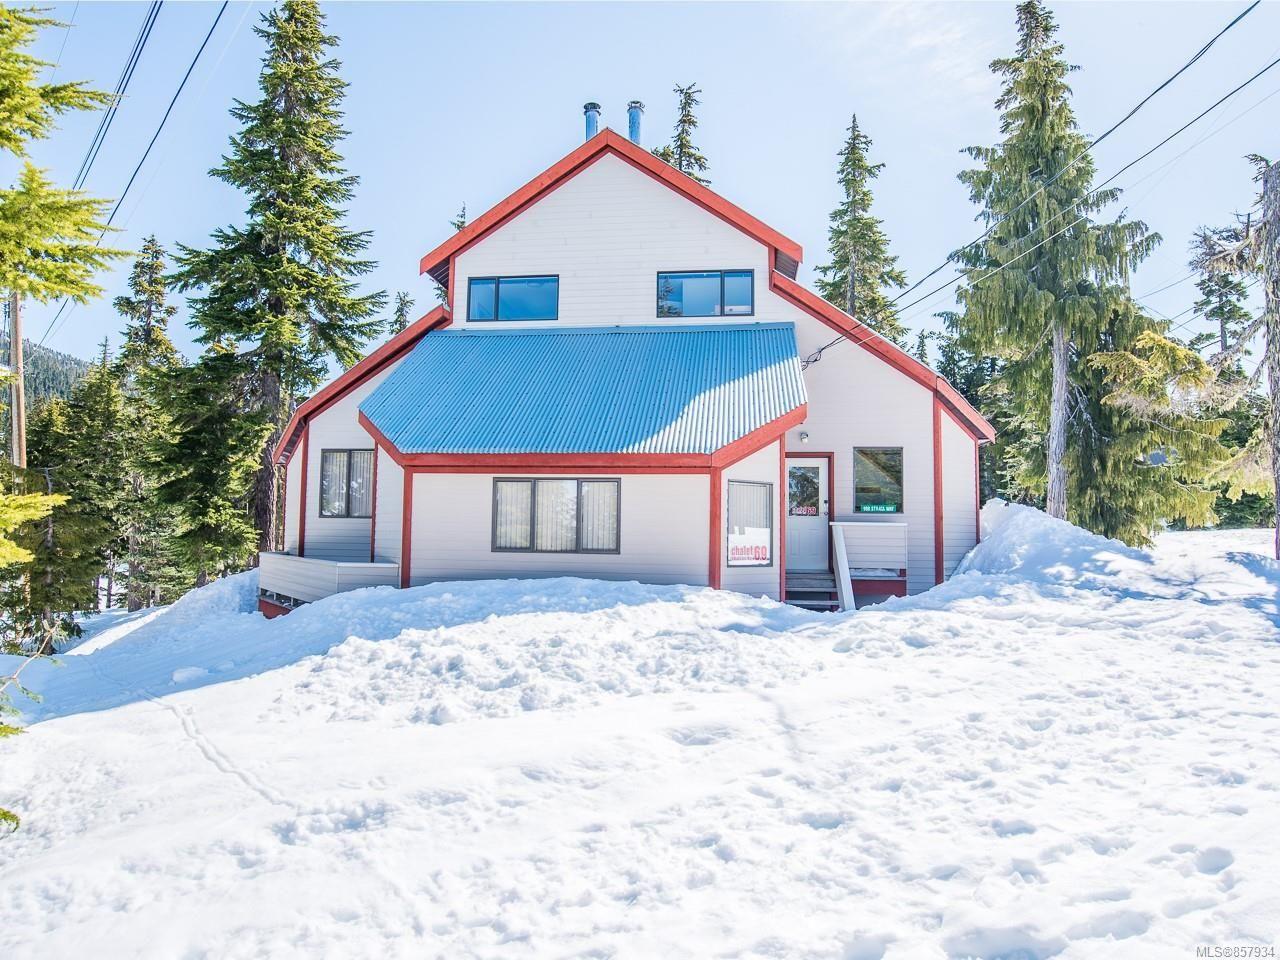 Photo 26: Photos: 998 STRATA Way in : CV Mt Washington House for sale (Comox Valley)  : MLS®# 857934